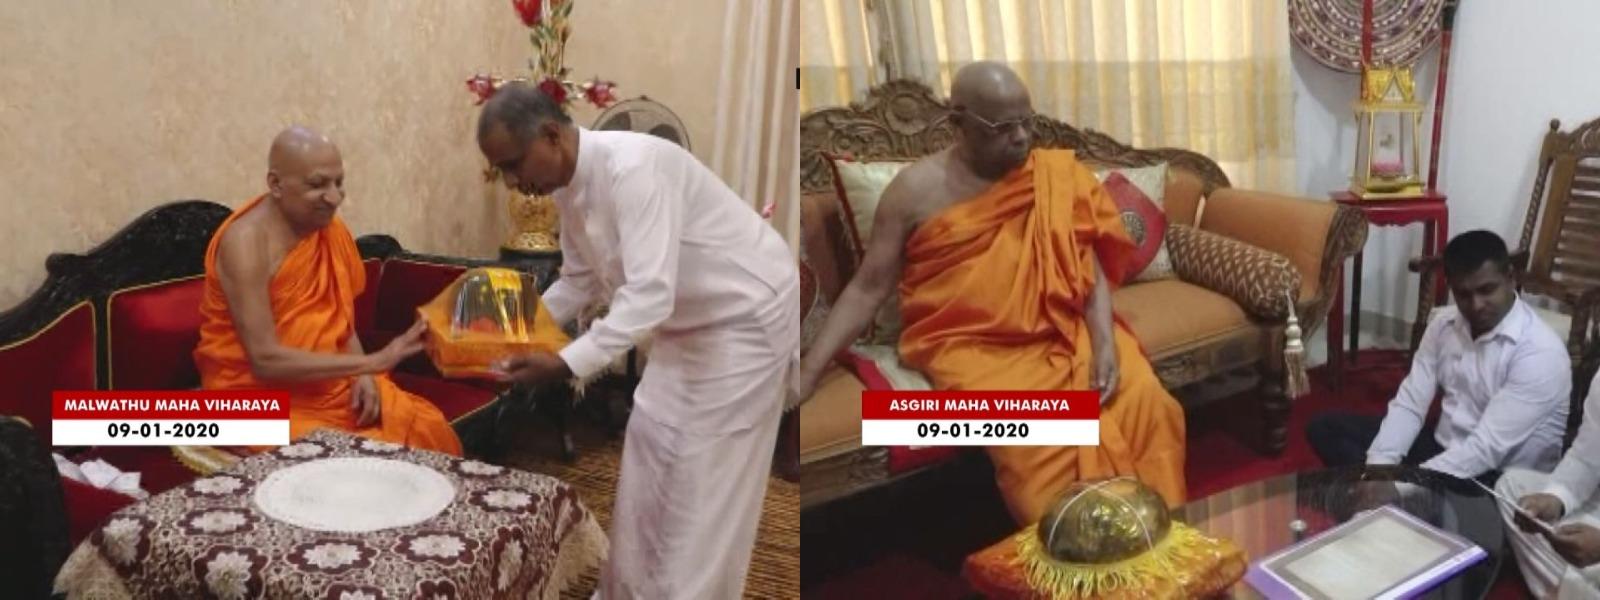 Aluthen Hithana Api Organization meets Chief Prelates